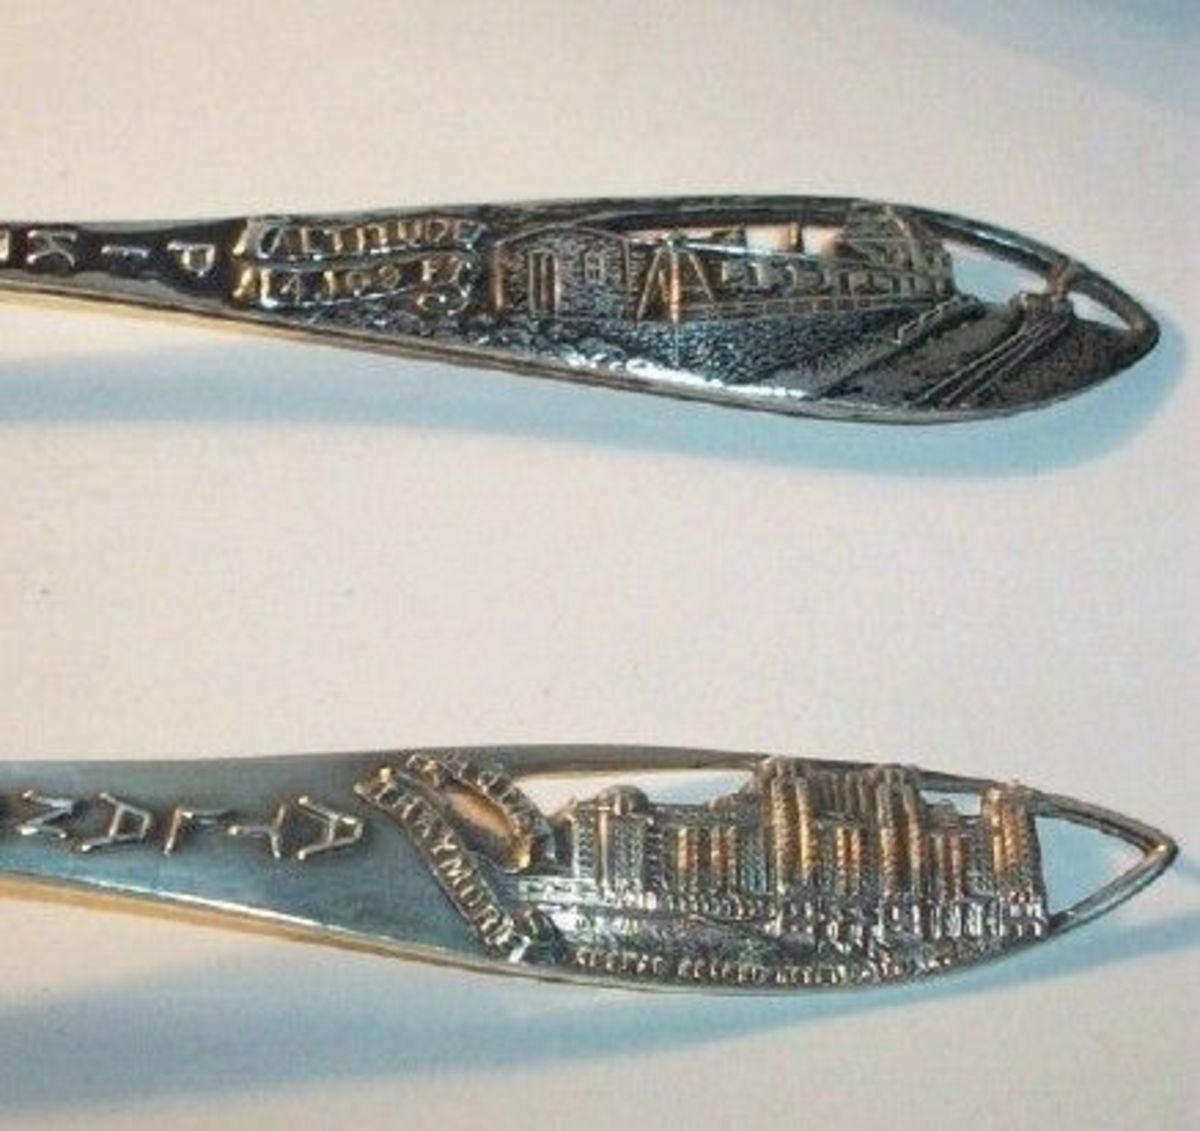 Sterling Souvenir Spoons, Photo Credit: Bexley